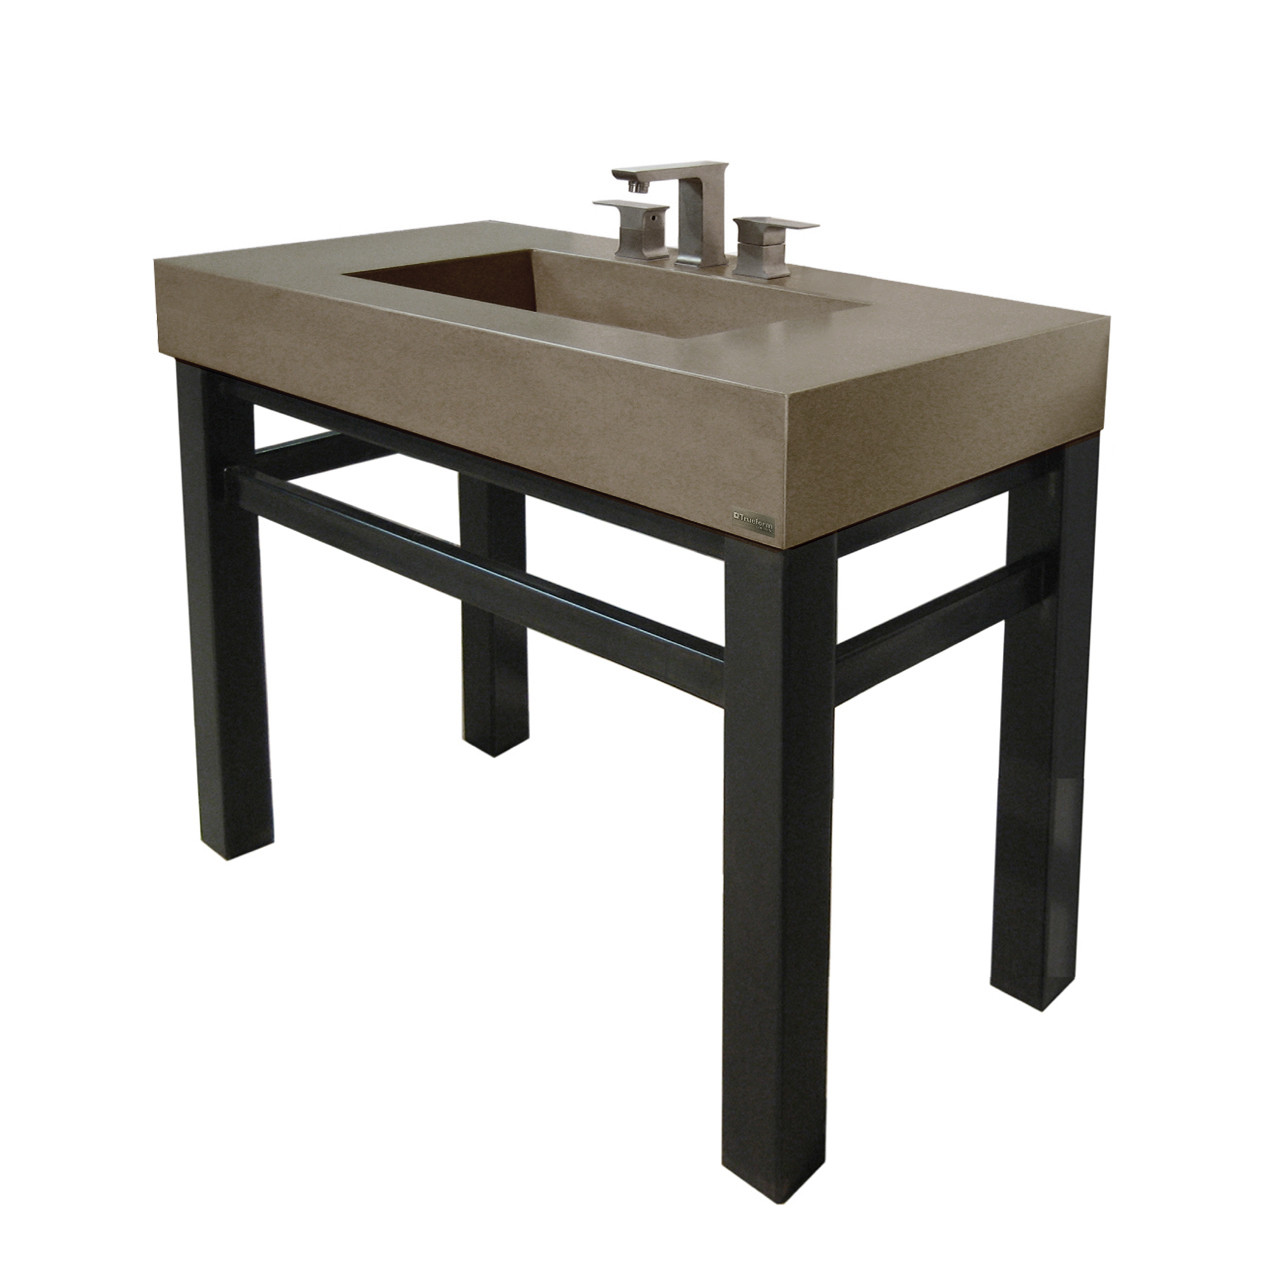 36 Industrial Vanity With Concrete Rectangle Sink Trueform Concrete